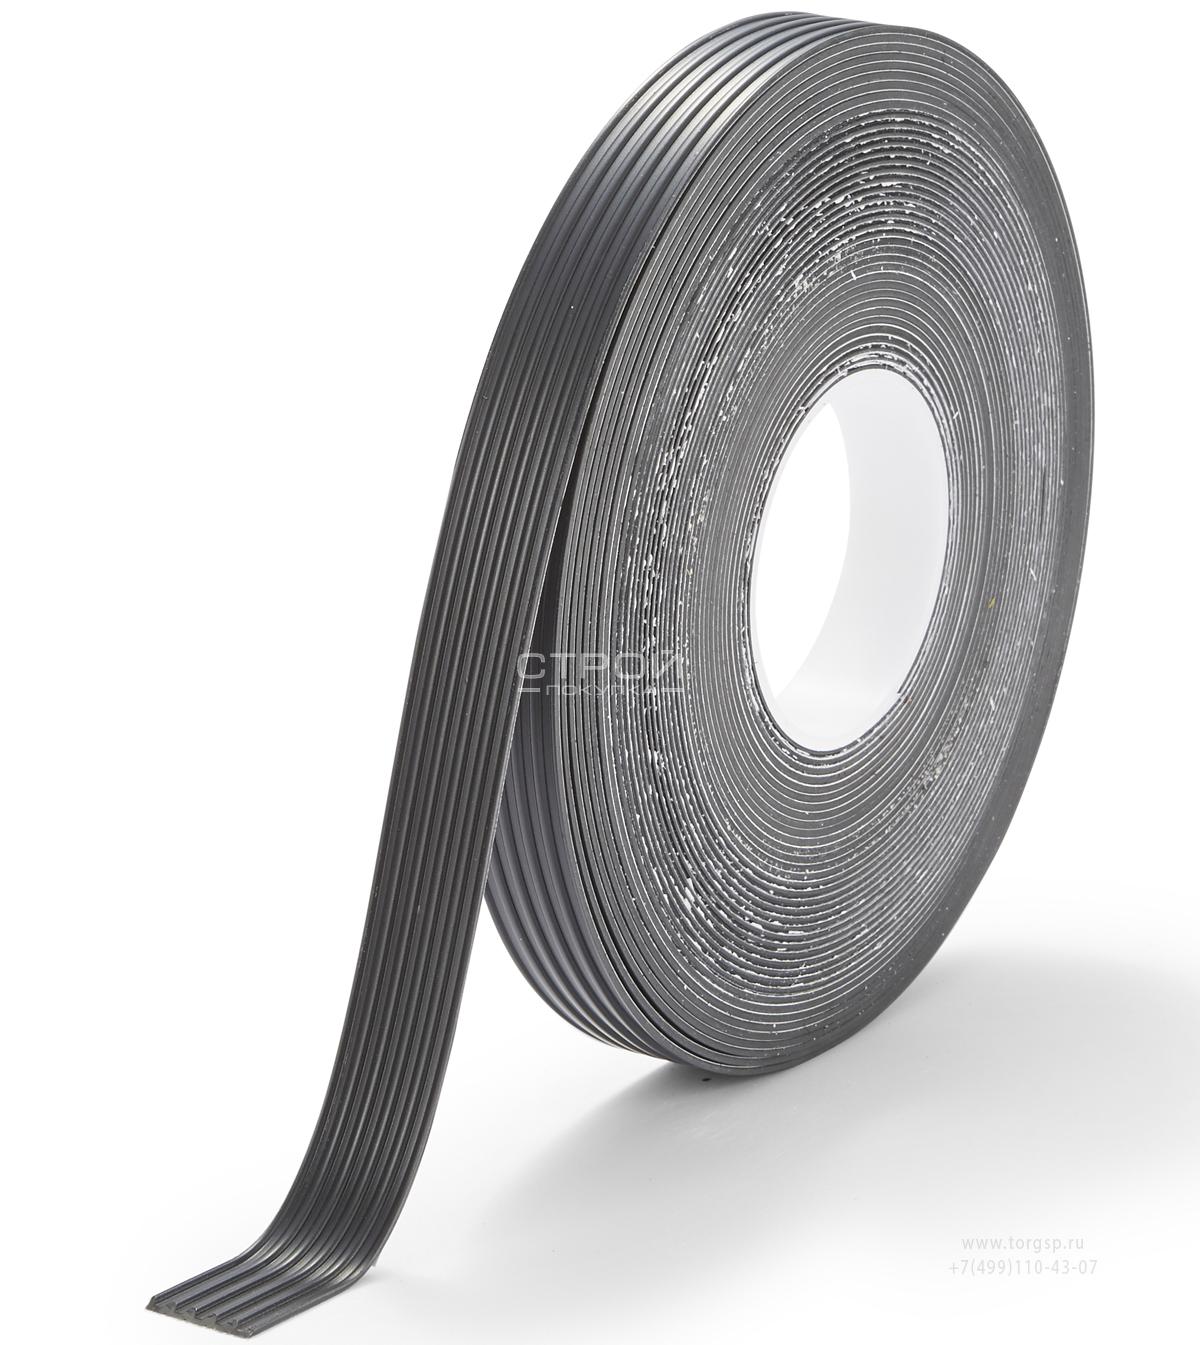 Ребристая противоскользящая лента Heskins h3435n 2,5 см